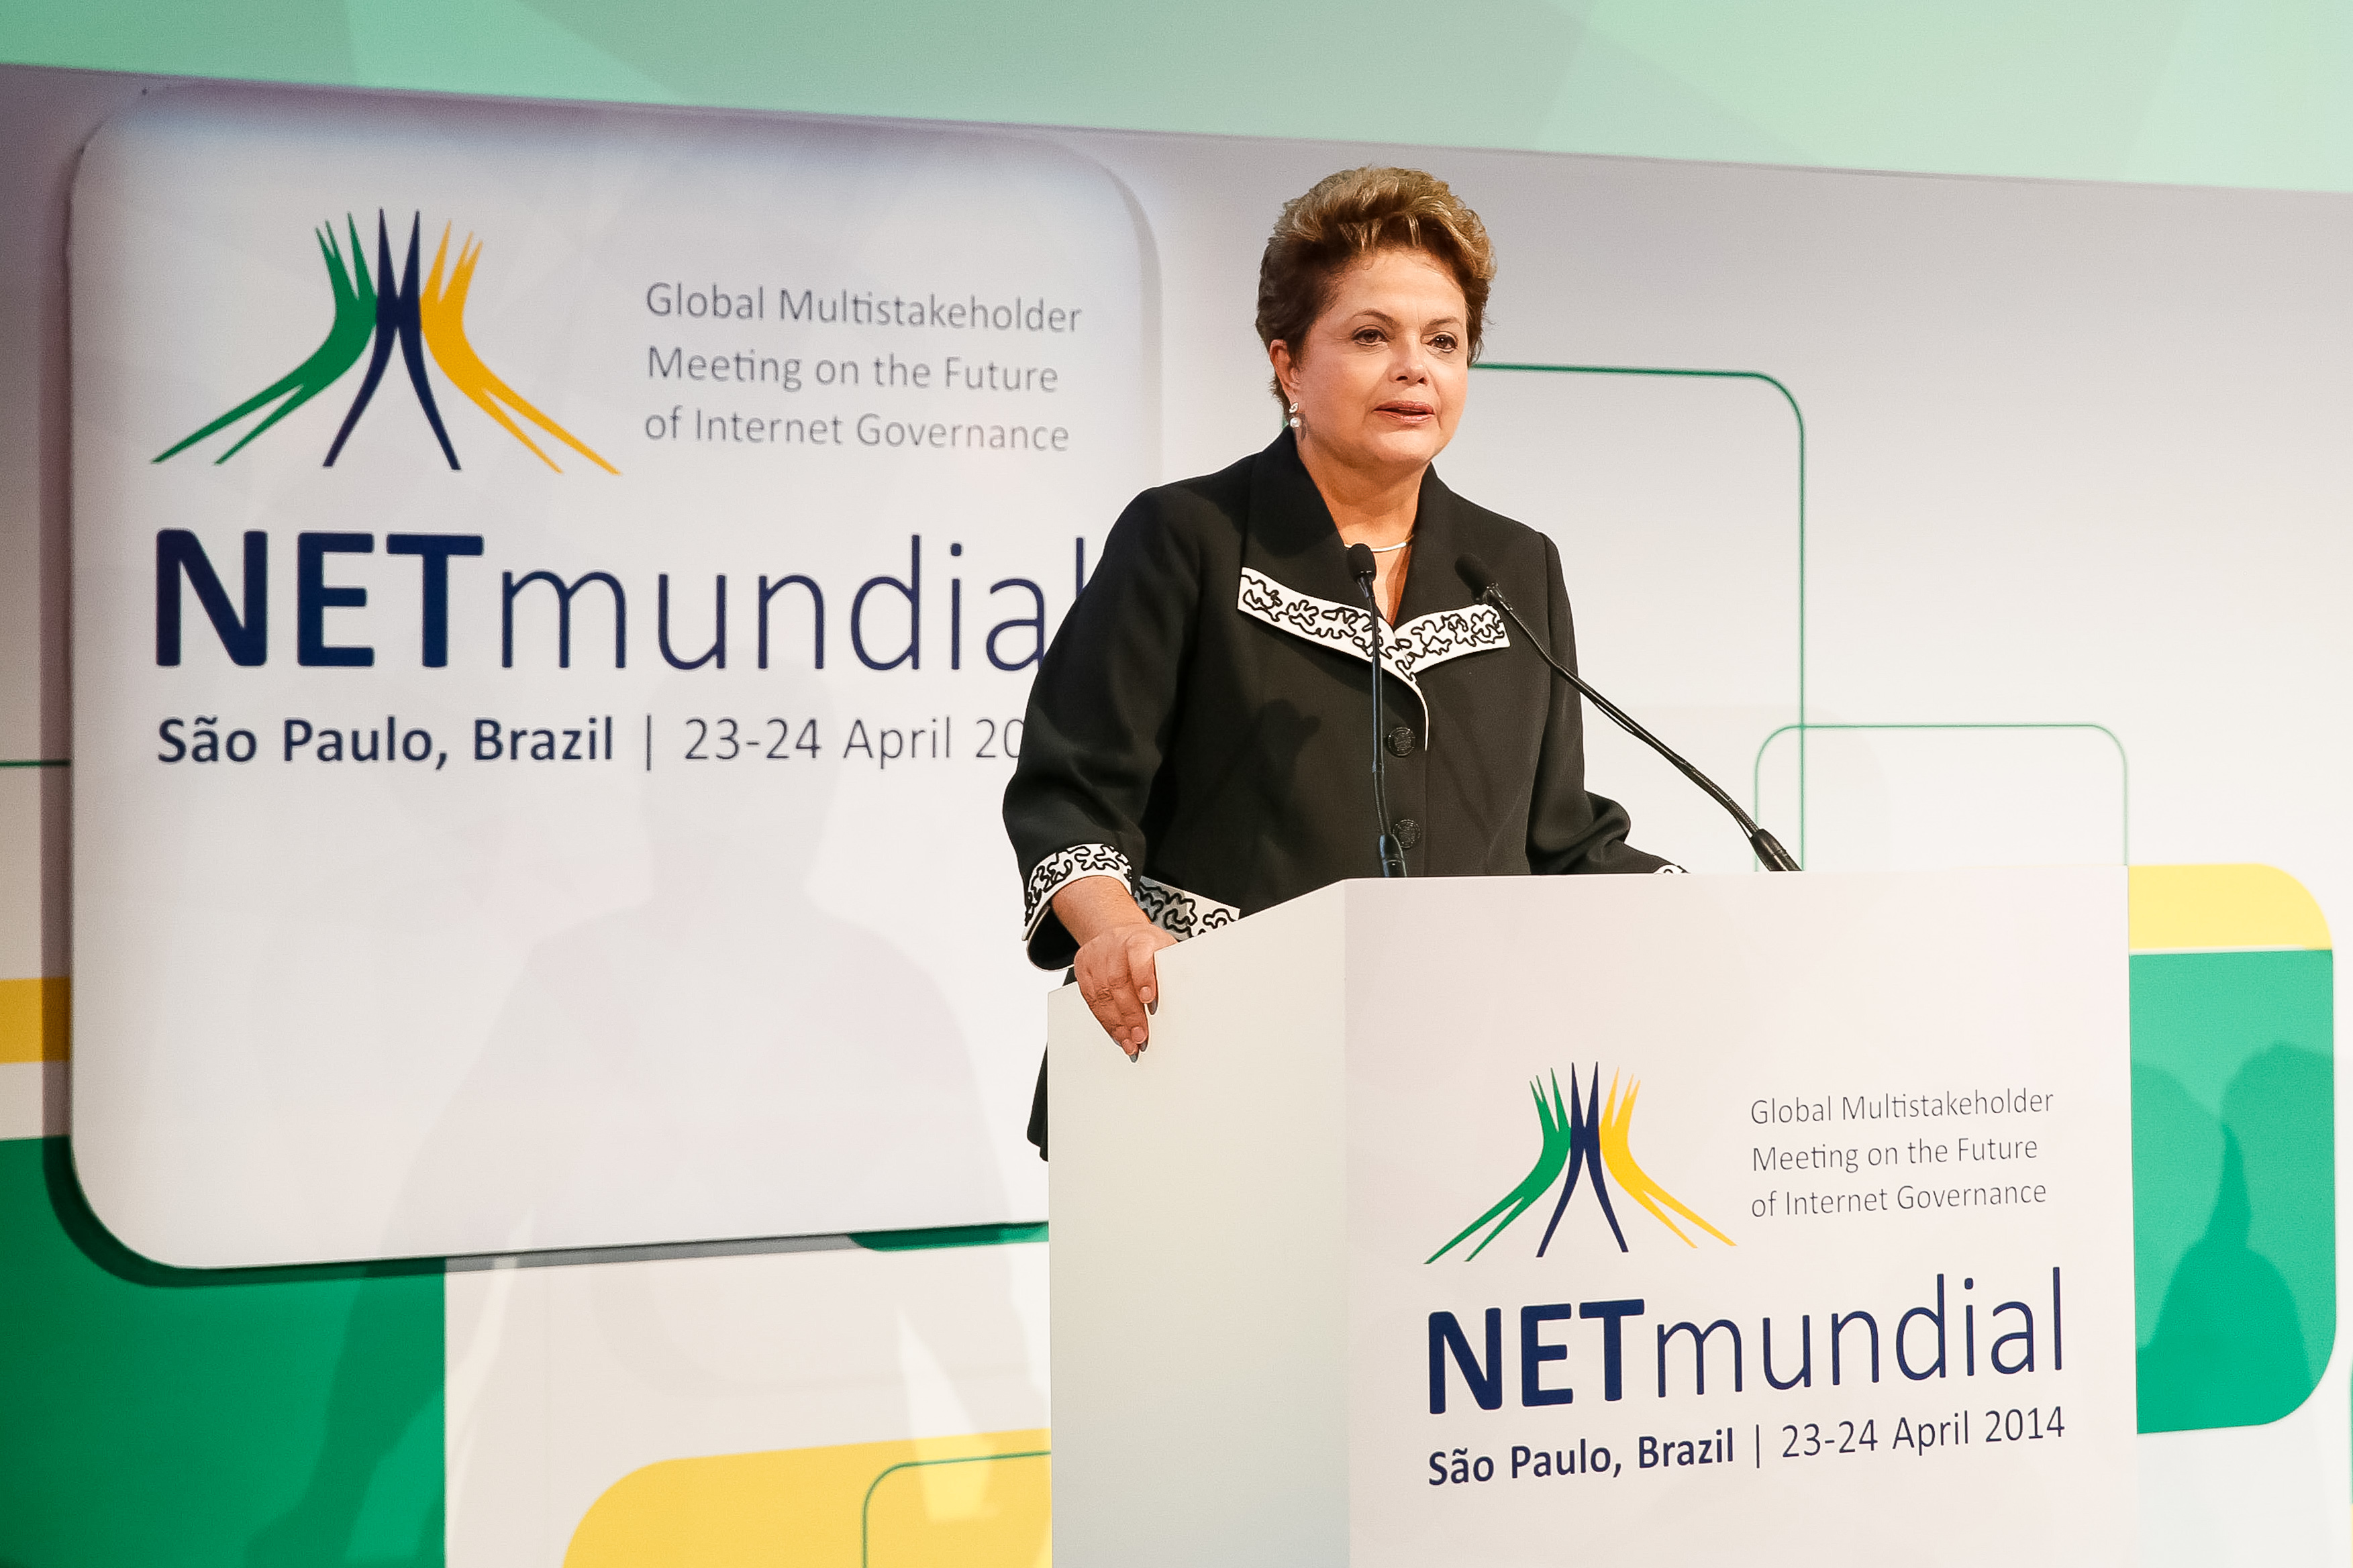 NETmundial 2014